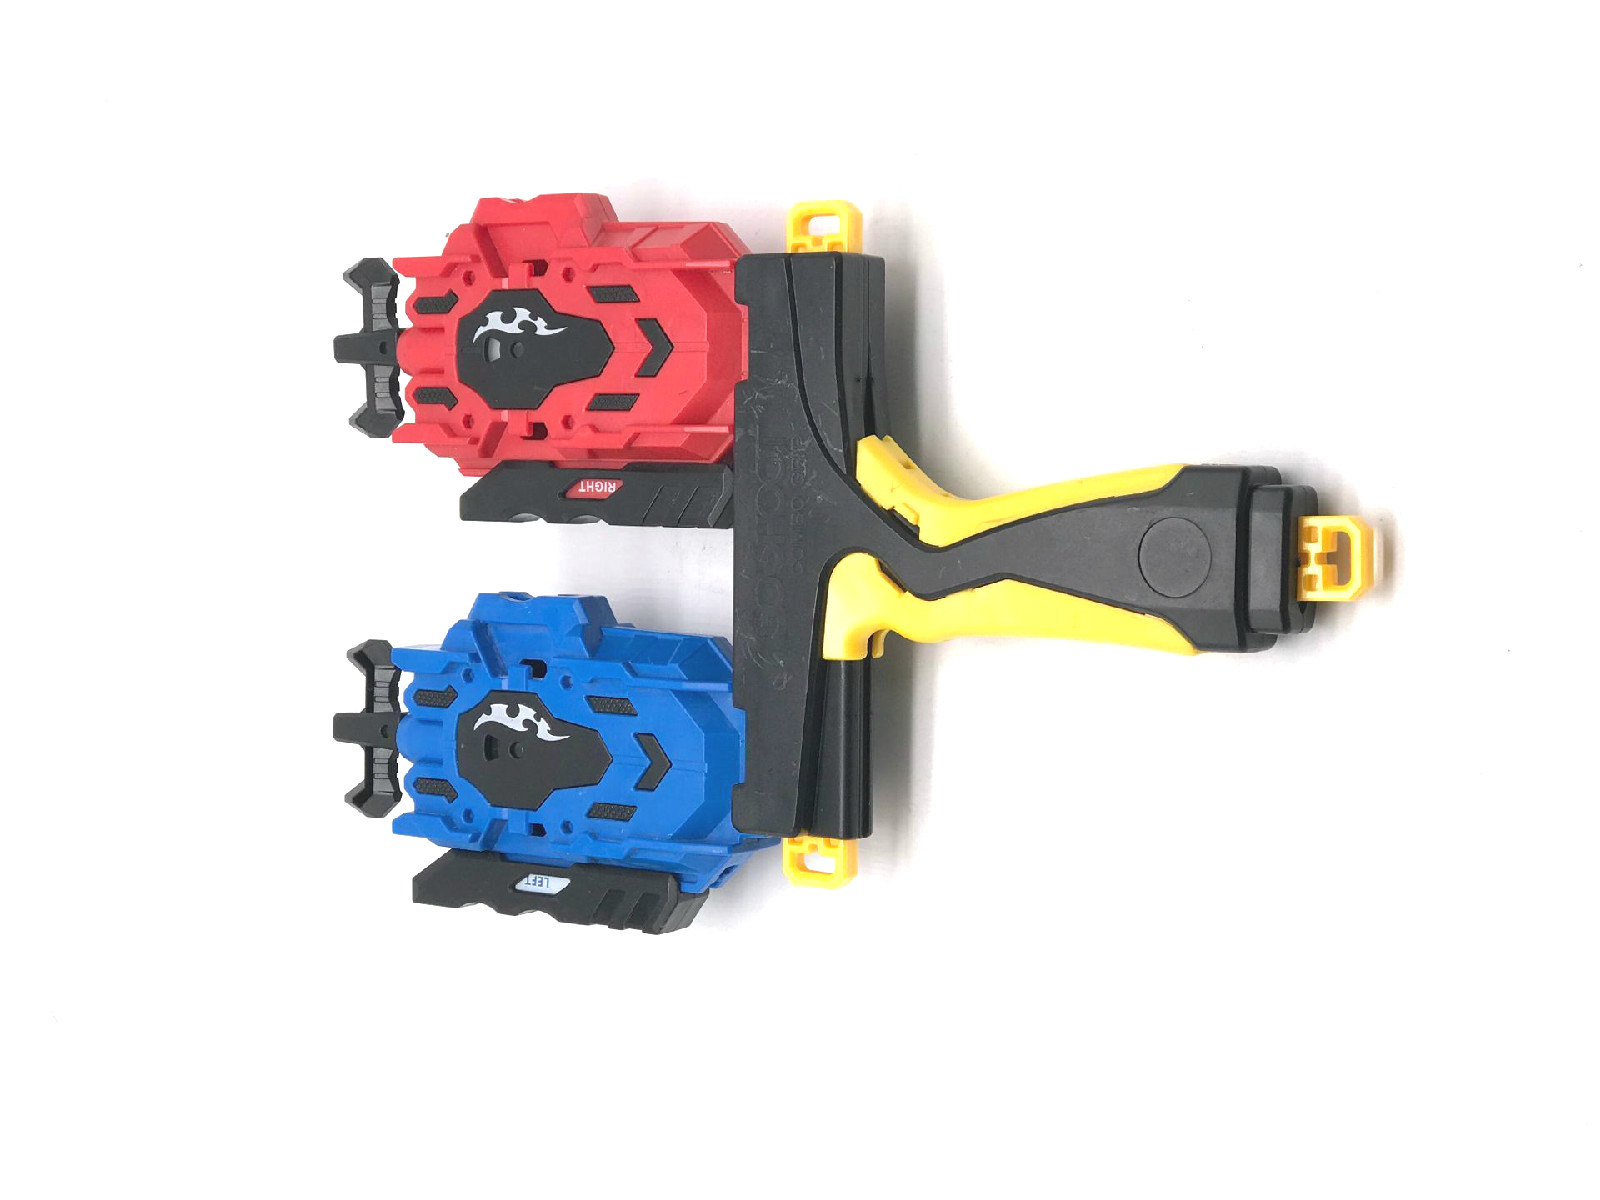 2019 New Blade Beblade Handle Transmitter Accessories Blade Blade Burst Puzzle Toy Kids Toy Gyro Children Plastic